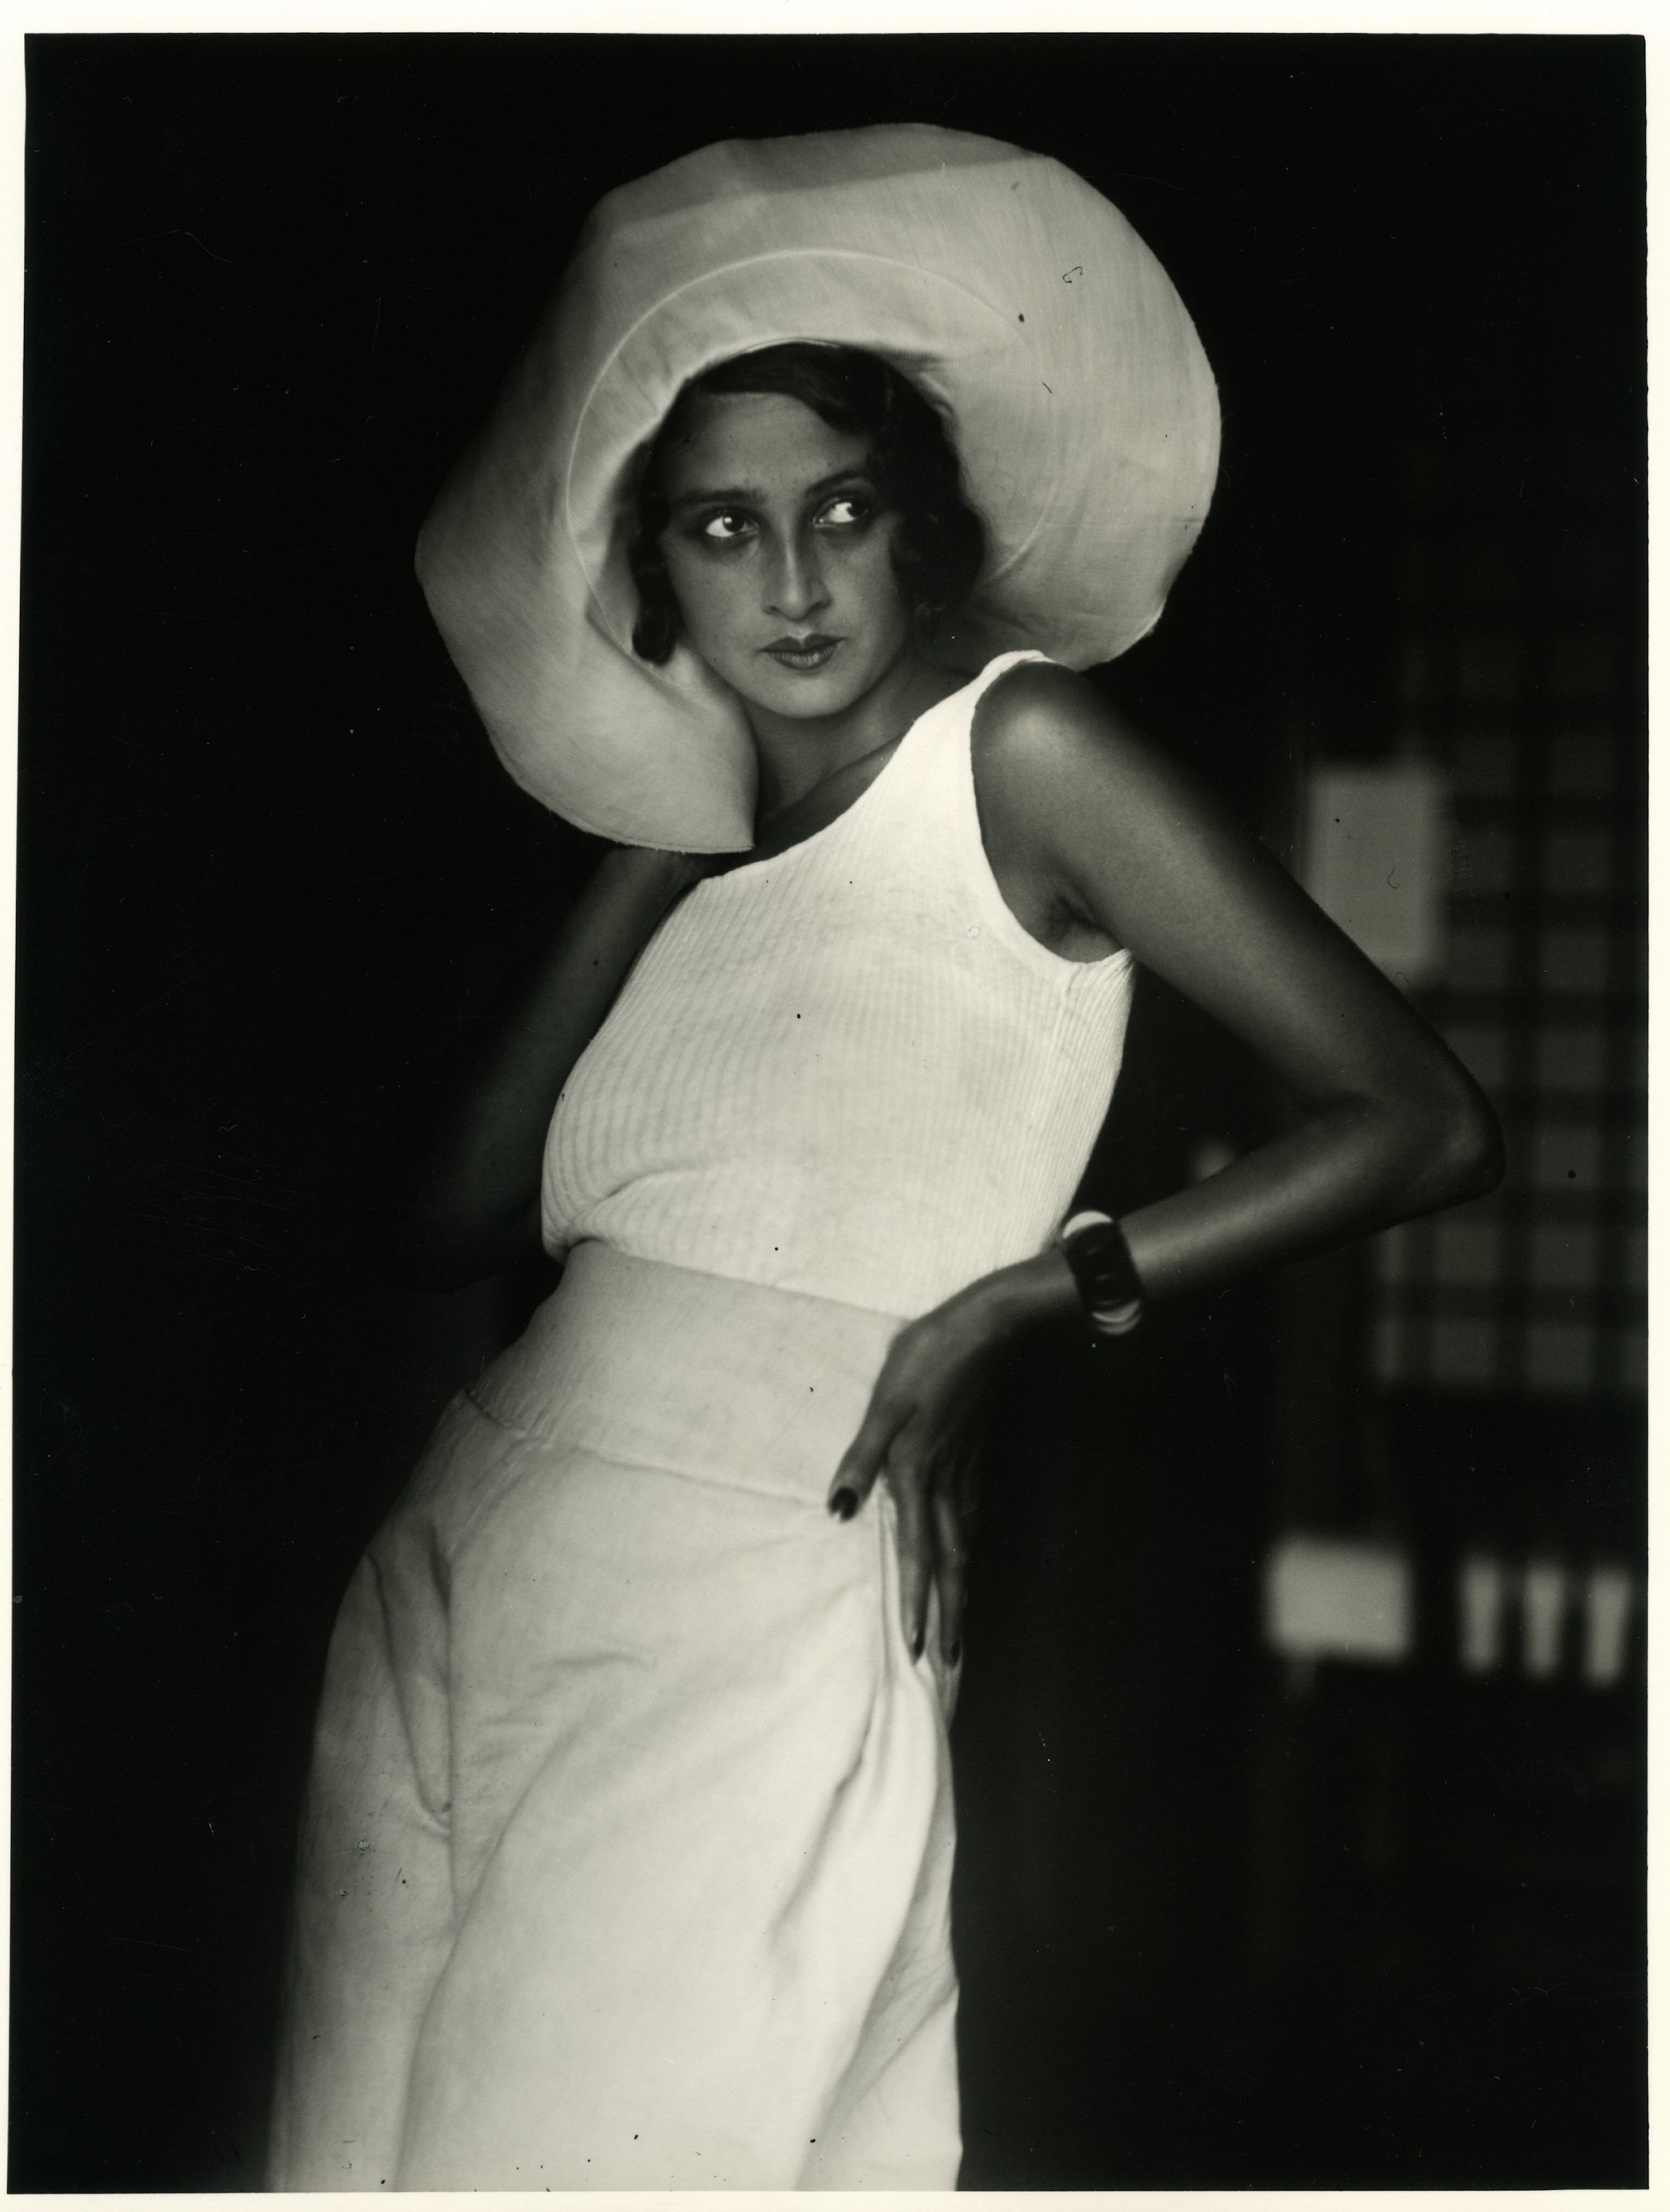 Renée, Biarritz, August 1930